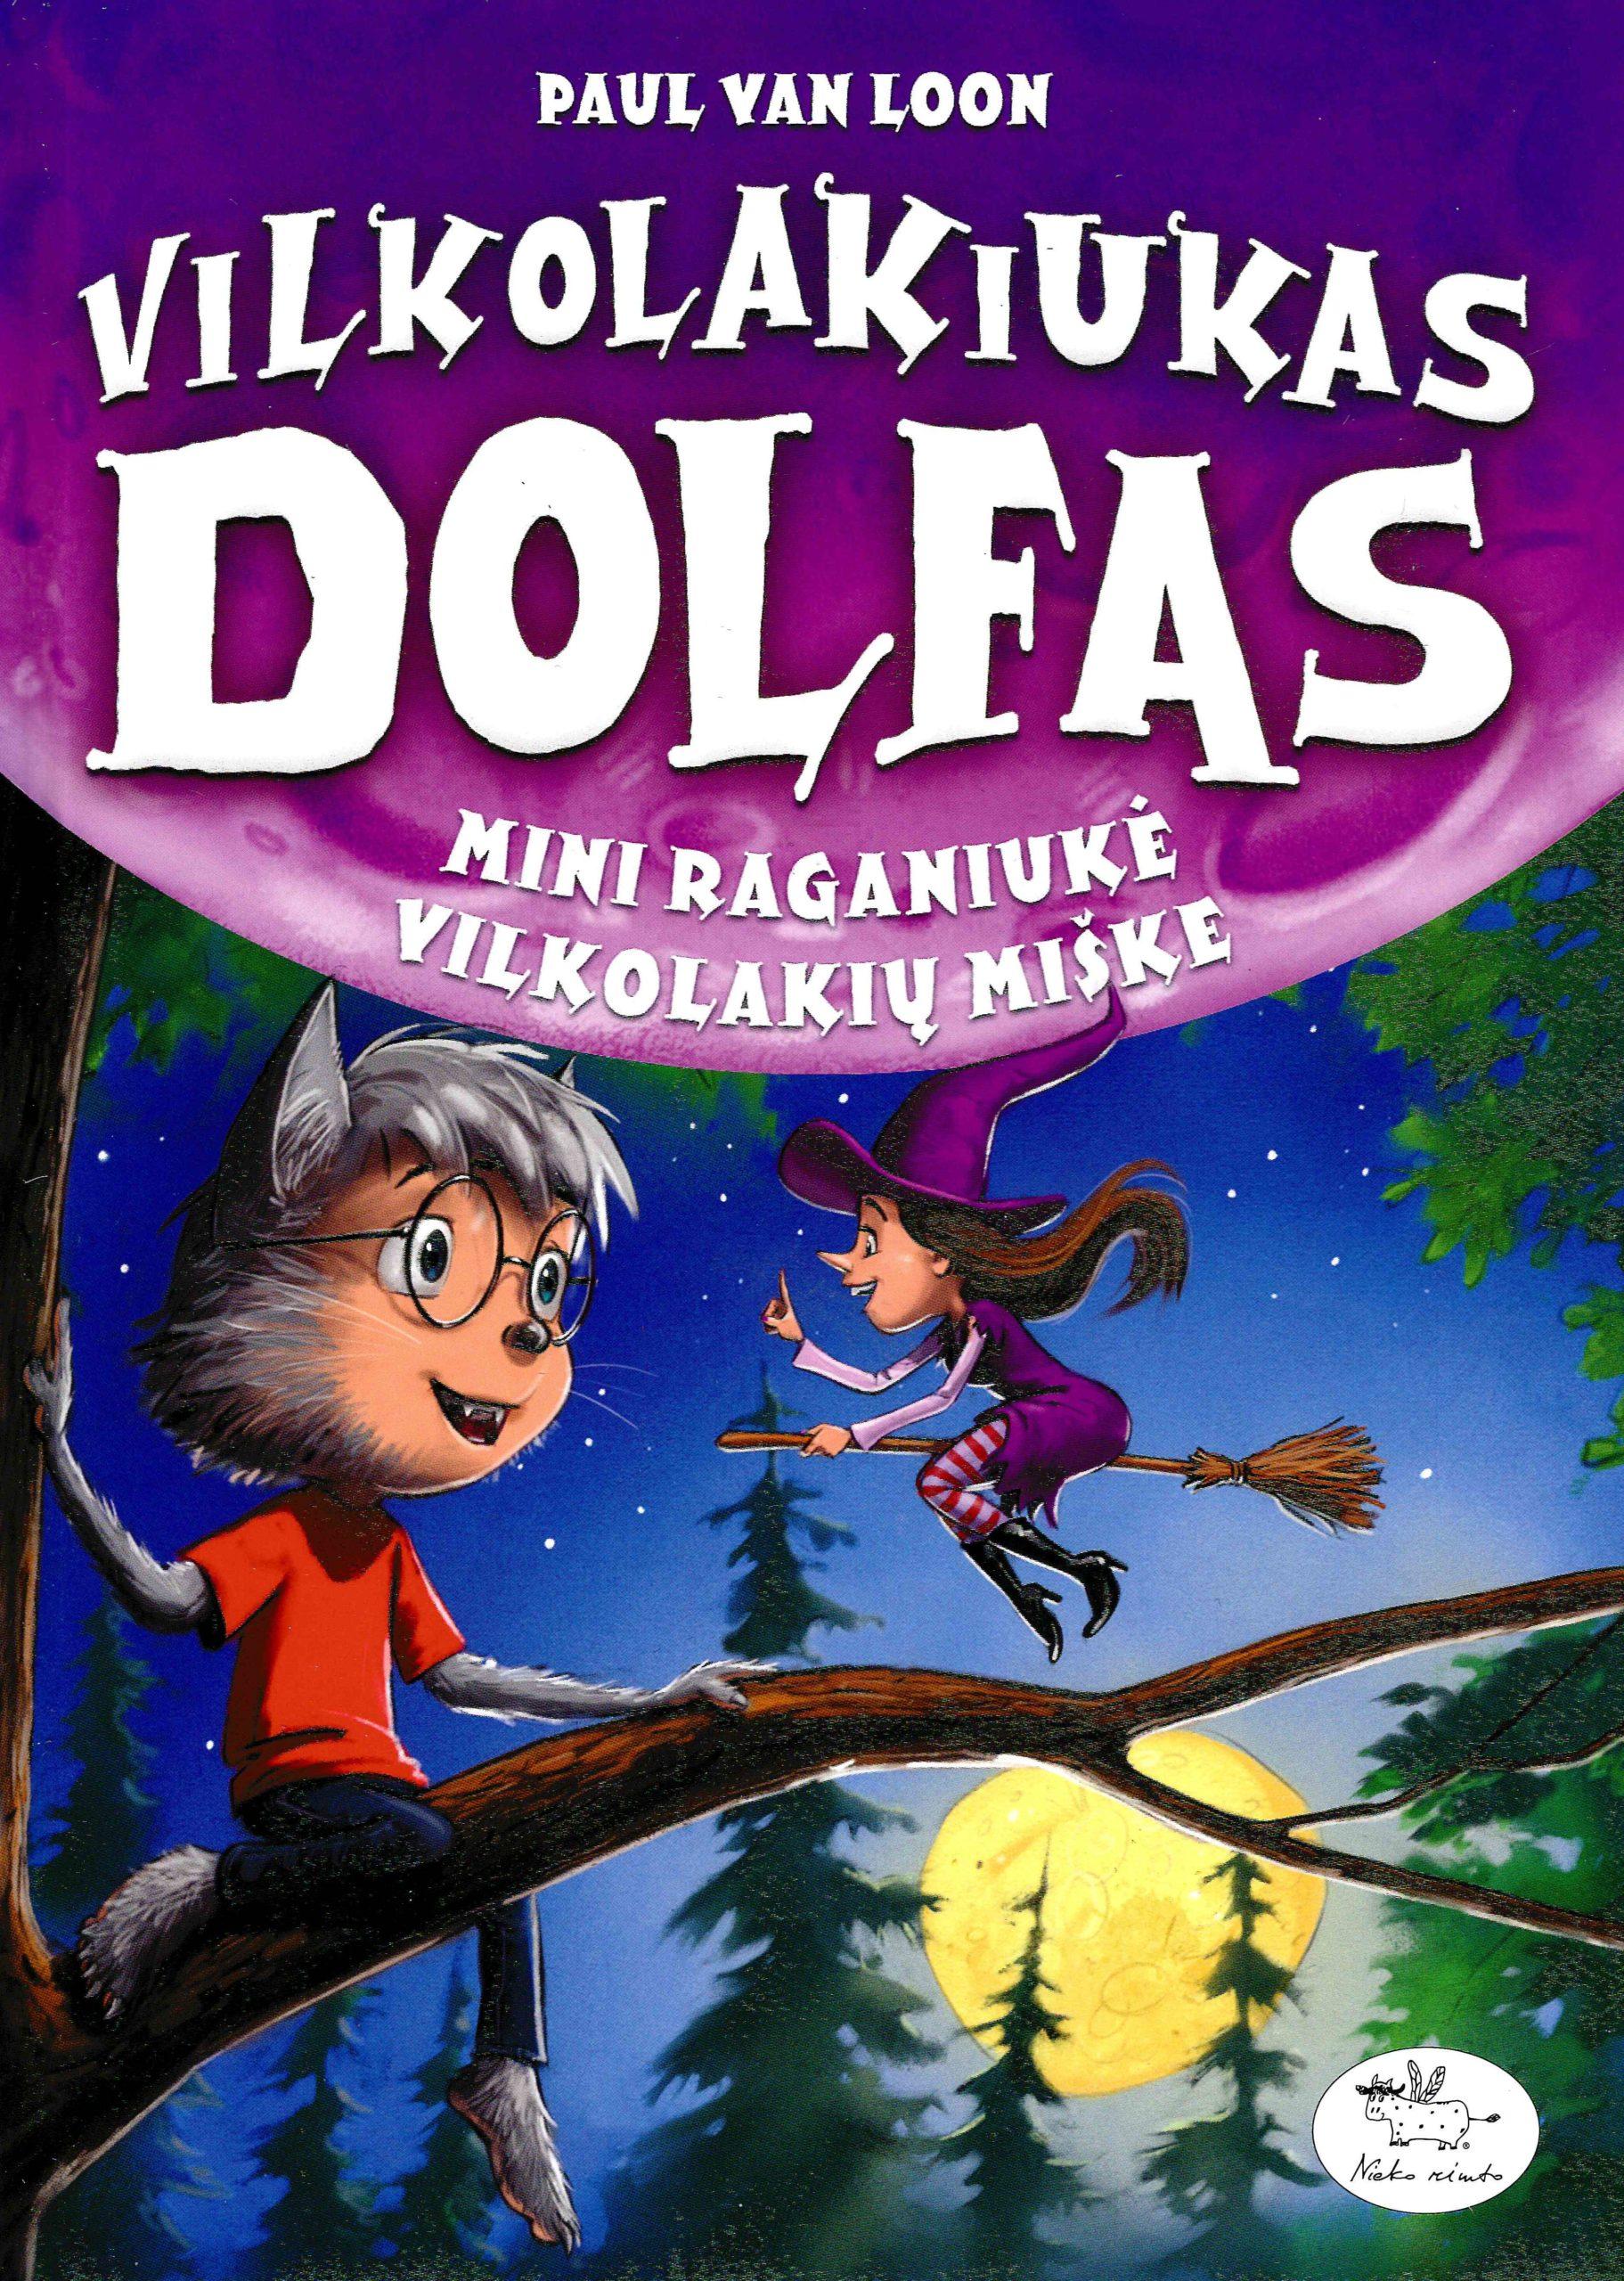 Vilkolakiukas Dolfas. Mini raganiukė Vilkolakių miške